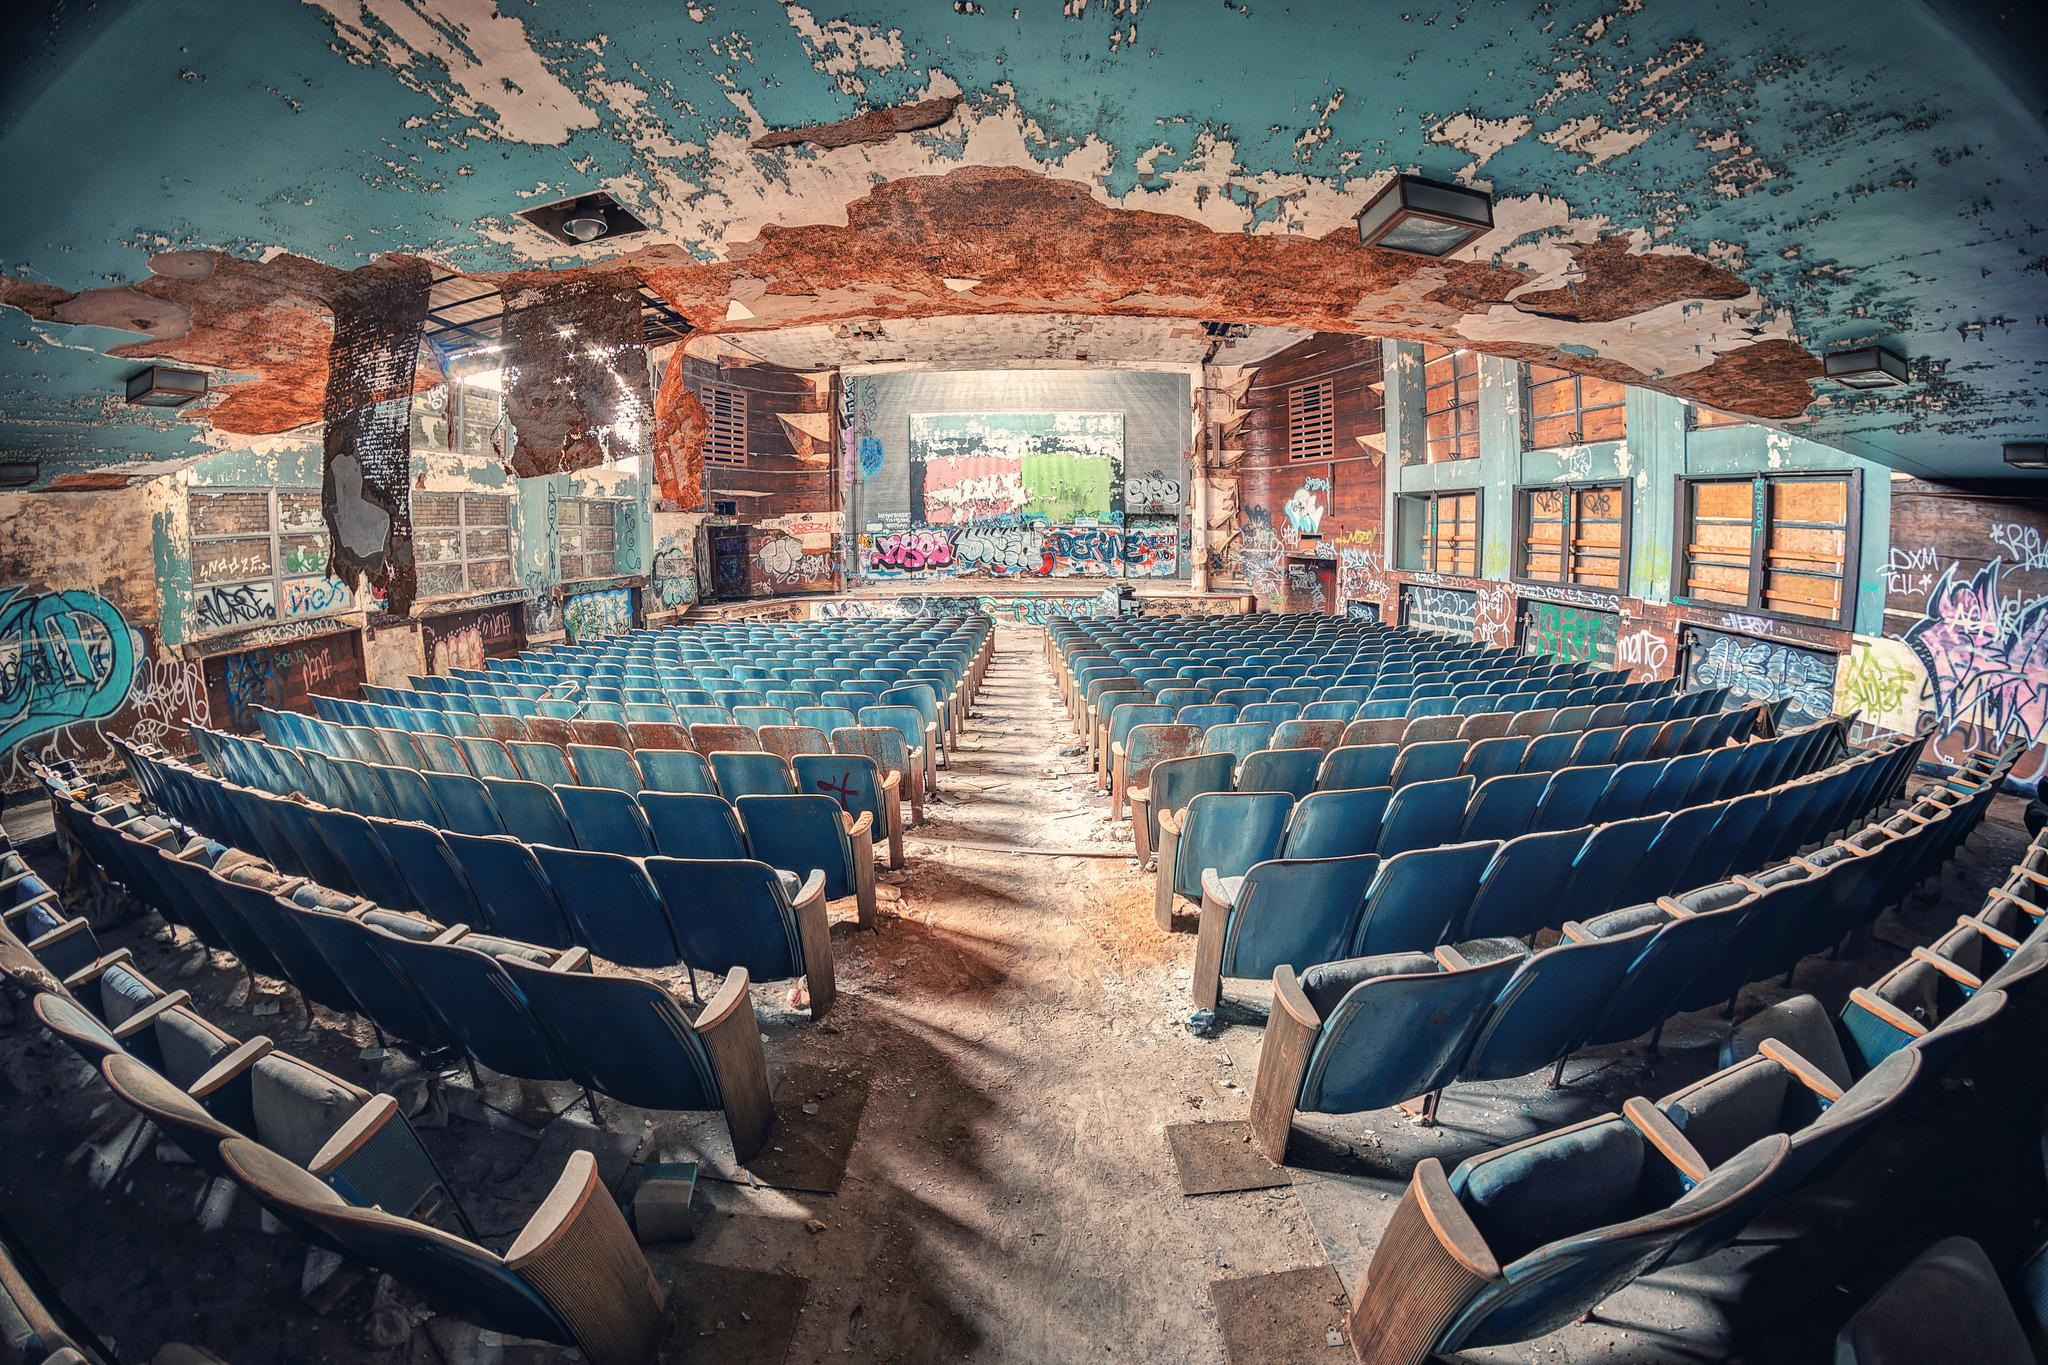 Auditorium, Актовый зал, архитектура